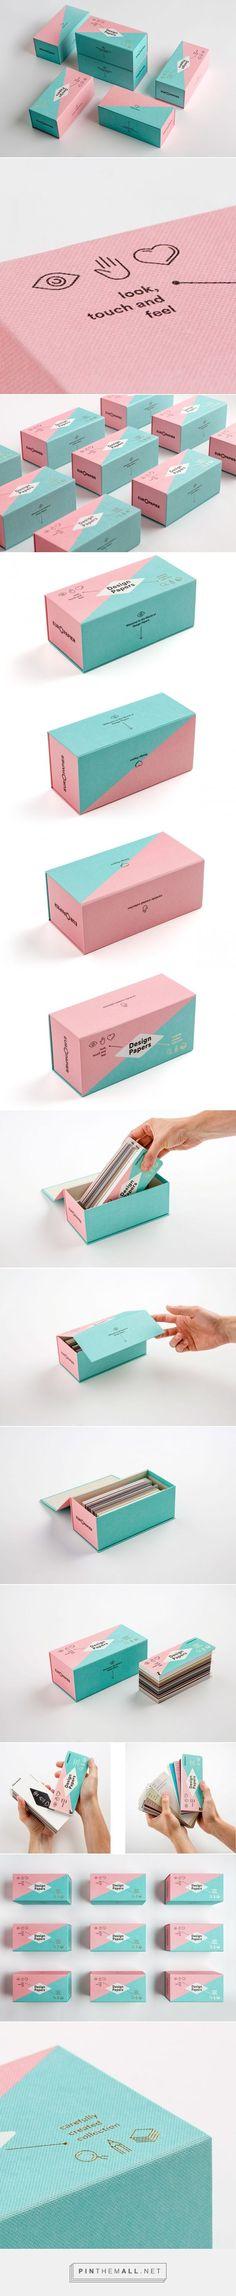 Design Papers 2016 packaging design by Metaklinika Logo Design, Web Design, Design Poster, Graphic Design Branding, Corporate Design, Identity Design, Layout Design, Brand Design, Brand Identity